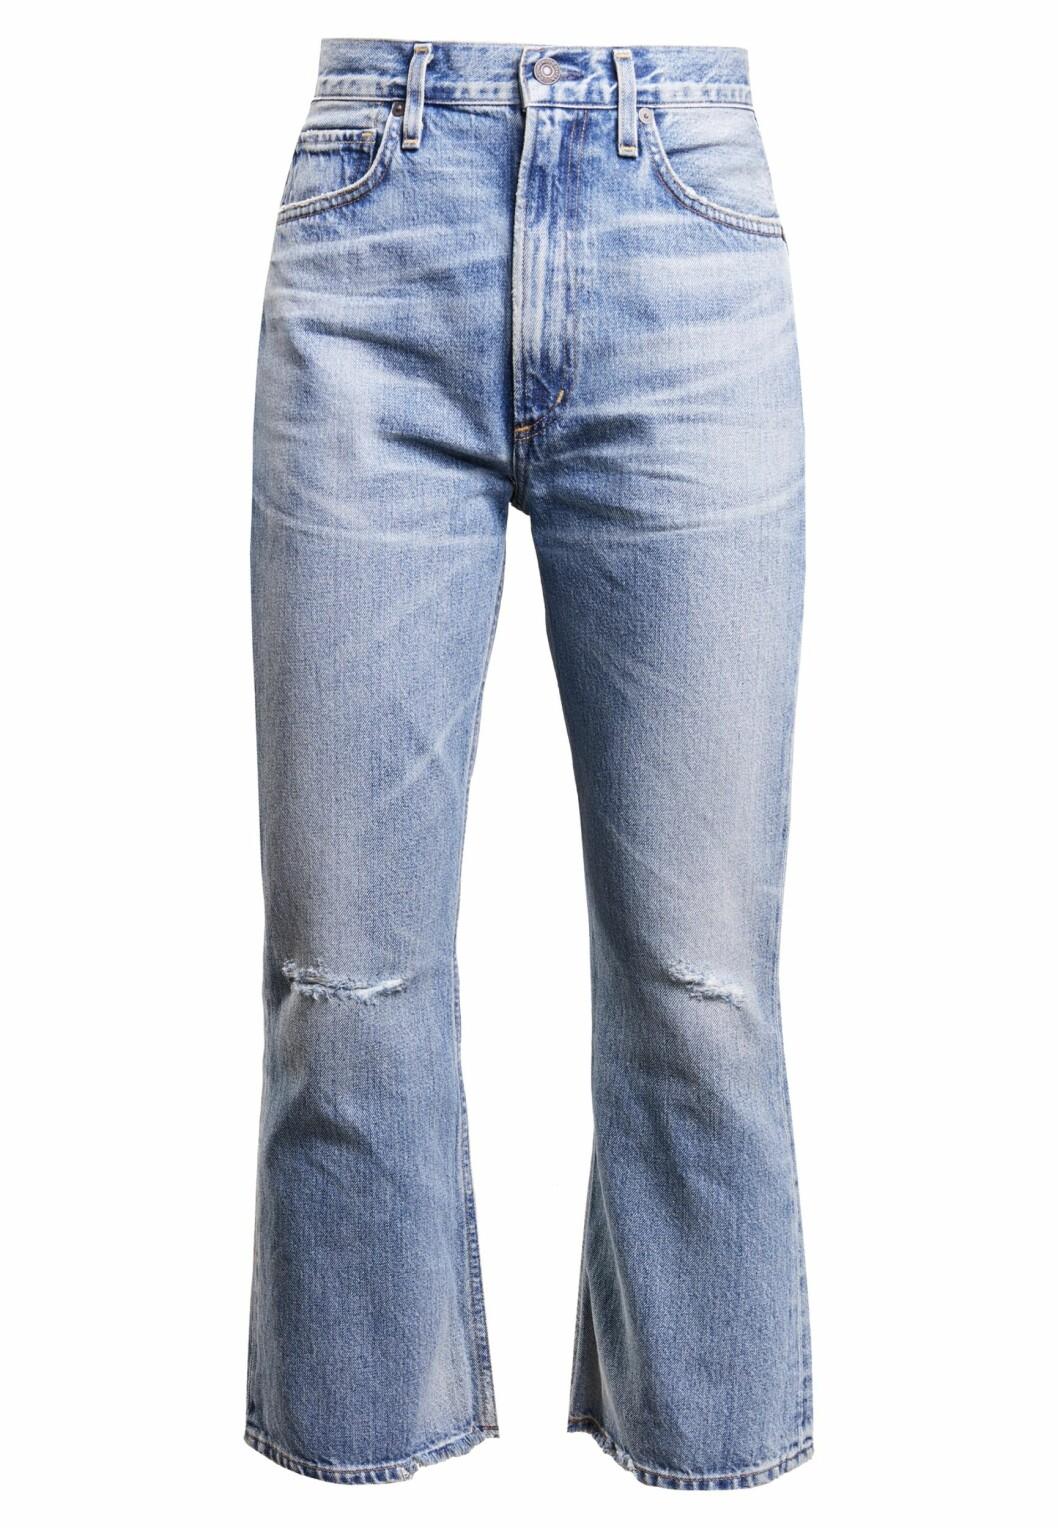 Jeans fra Citizens of Humanity via Zalando.no |3495,-| https://www.zalando.no/citizens-of-humanity-estella-flared-jeans-freebird-ci221n034-k11.html